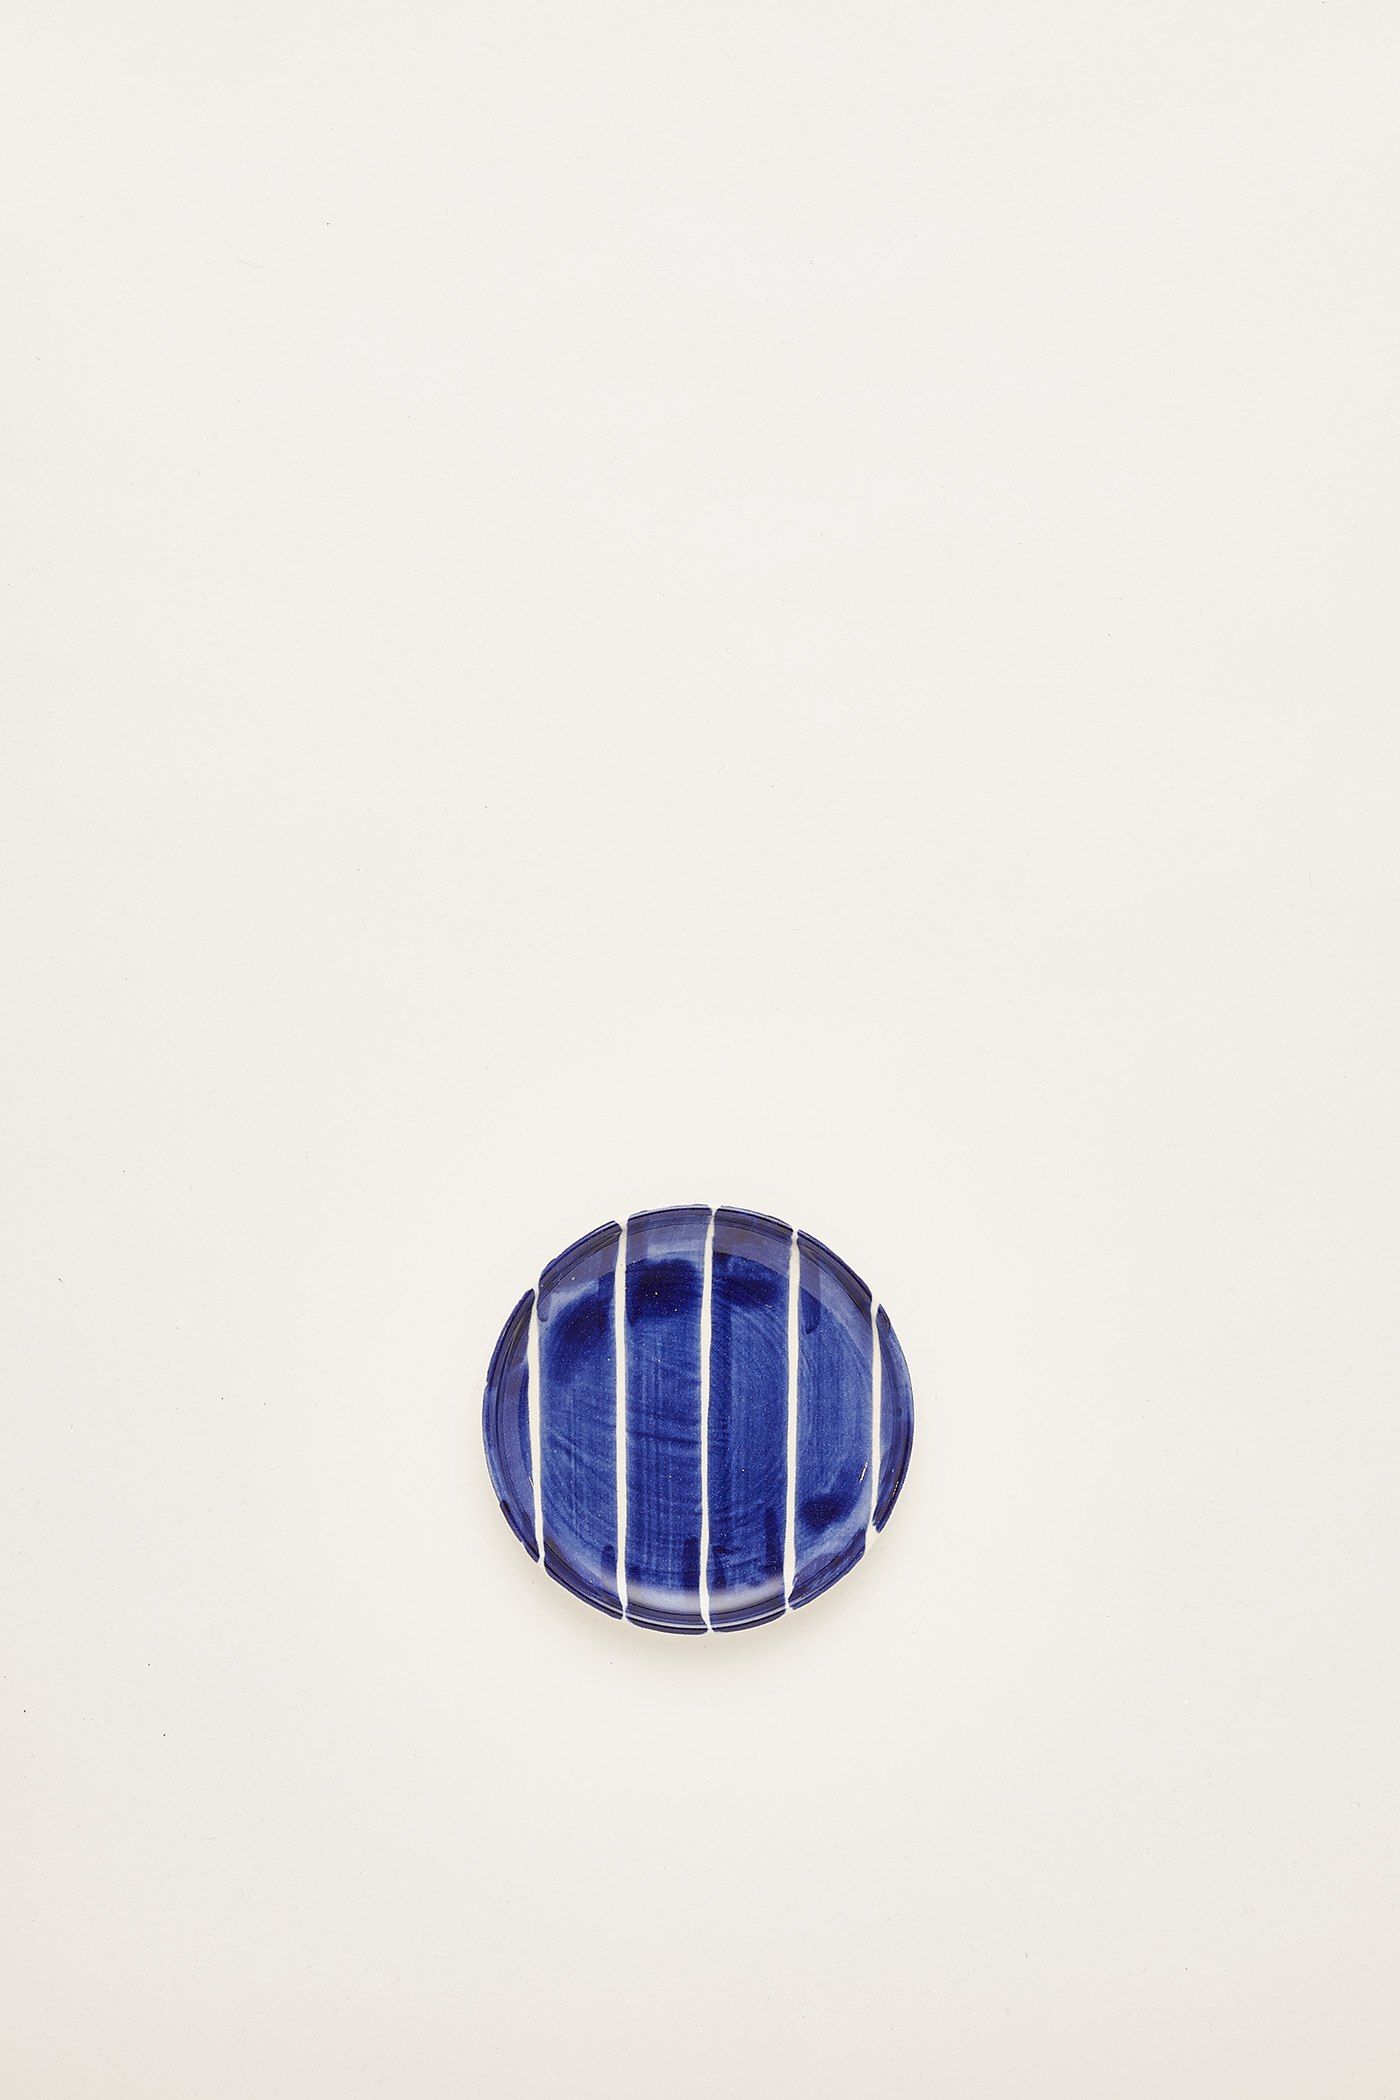 Tuhu Ceramics Small Plate